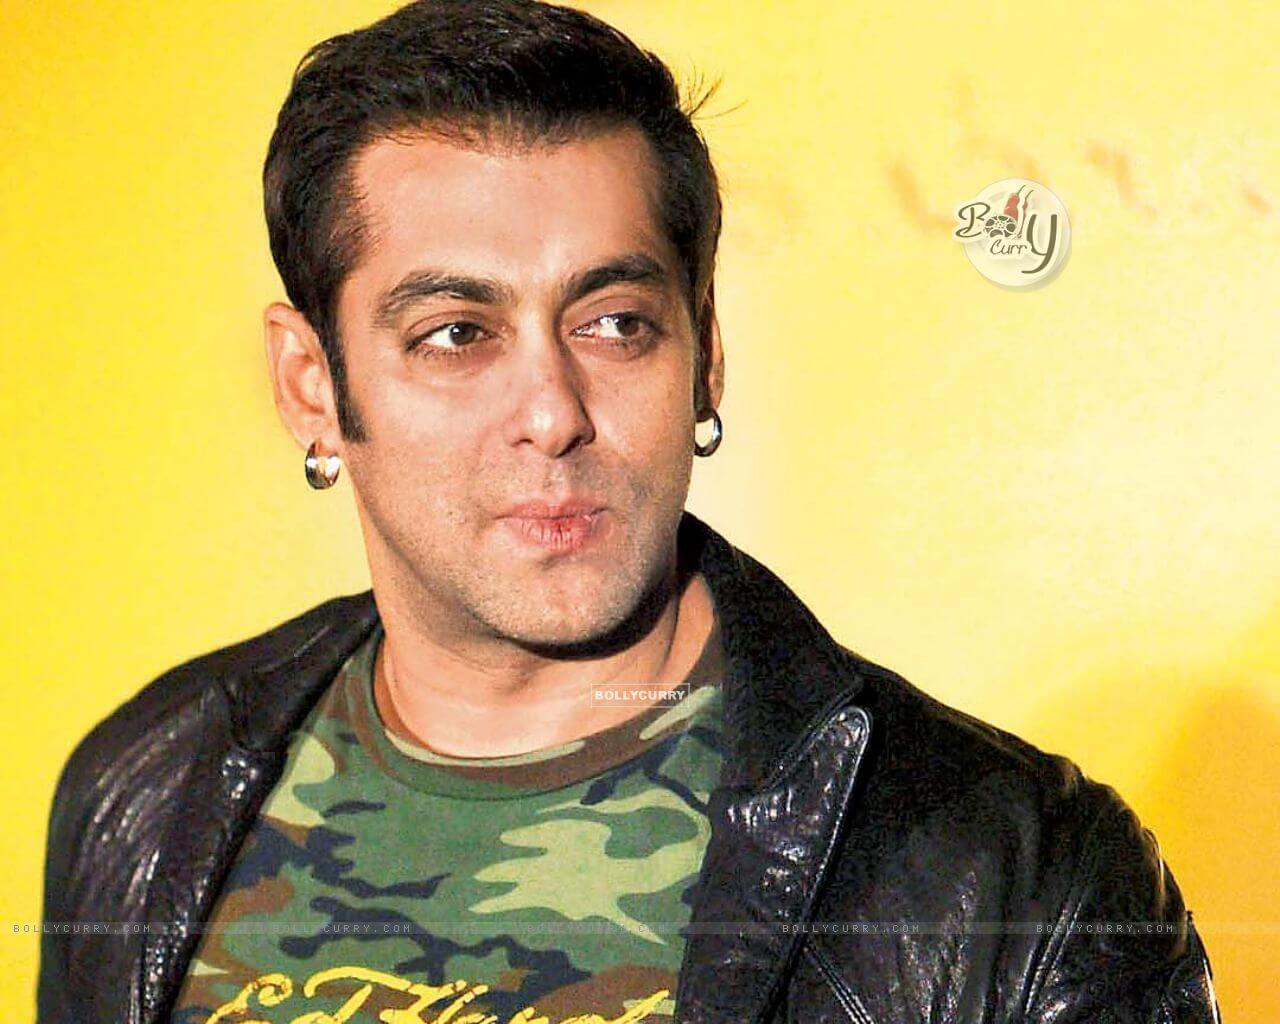 Salman Khan Photo, Age, News, Birthday, Height, Sister, Biography, Girlfriend, Awards, Address, Song, Video, Net Worth, Education, Twitter, Instagram, Facebook, Wiki, Imdb, Website, Youtube (40)